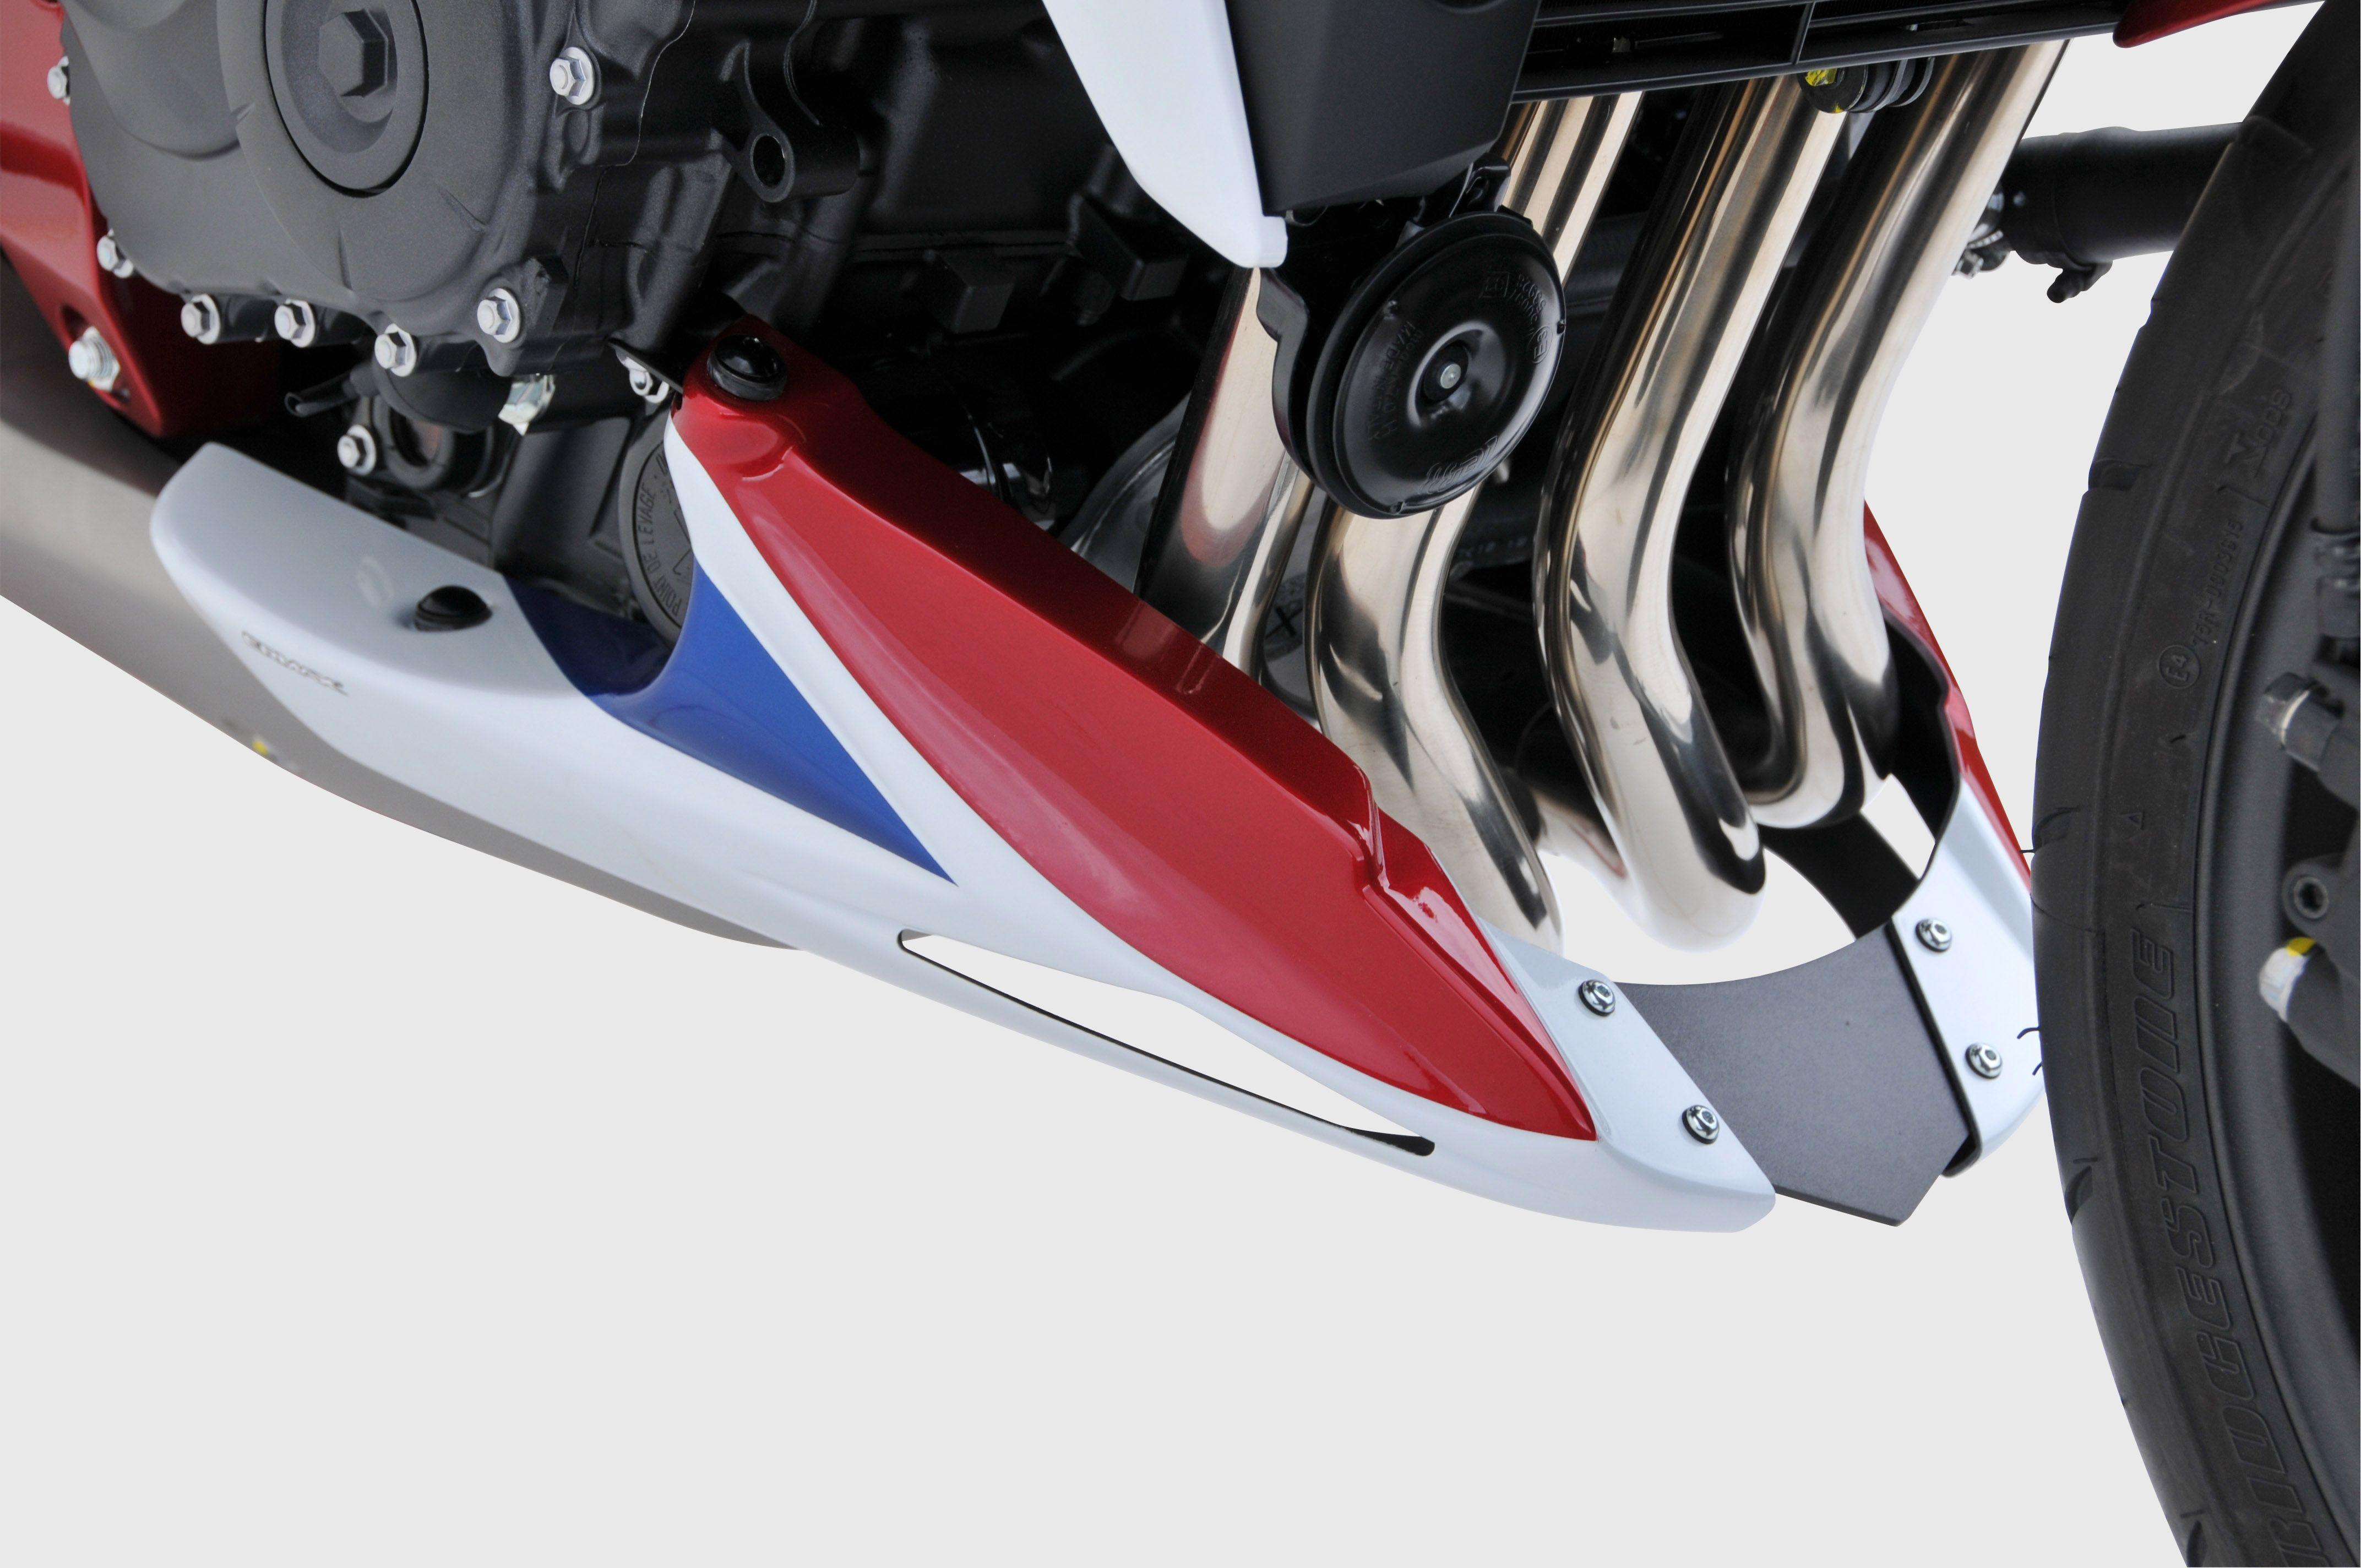 Rear Brake Pads for Honda CB1000R CB 1000R CB 1000 R 2009 2010 2011 2012 2013 2014 VFR800 XC Crossrunner 800 12-13 VFR 1200 F 10-13